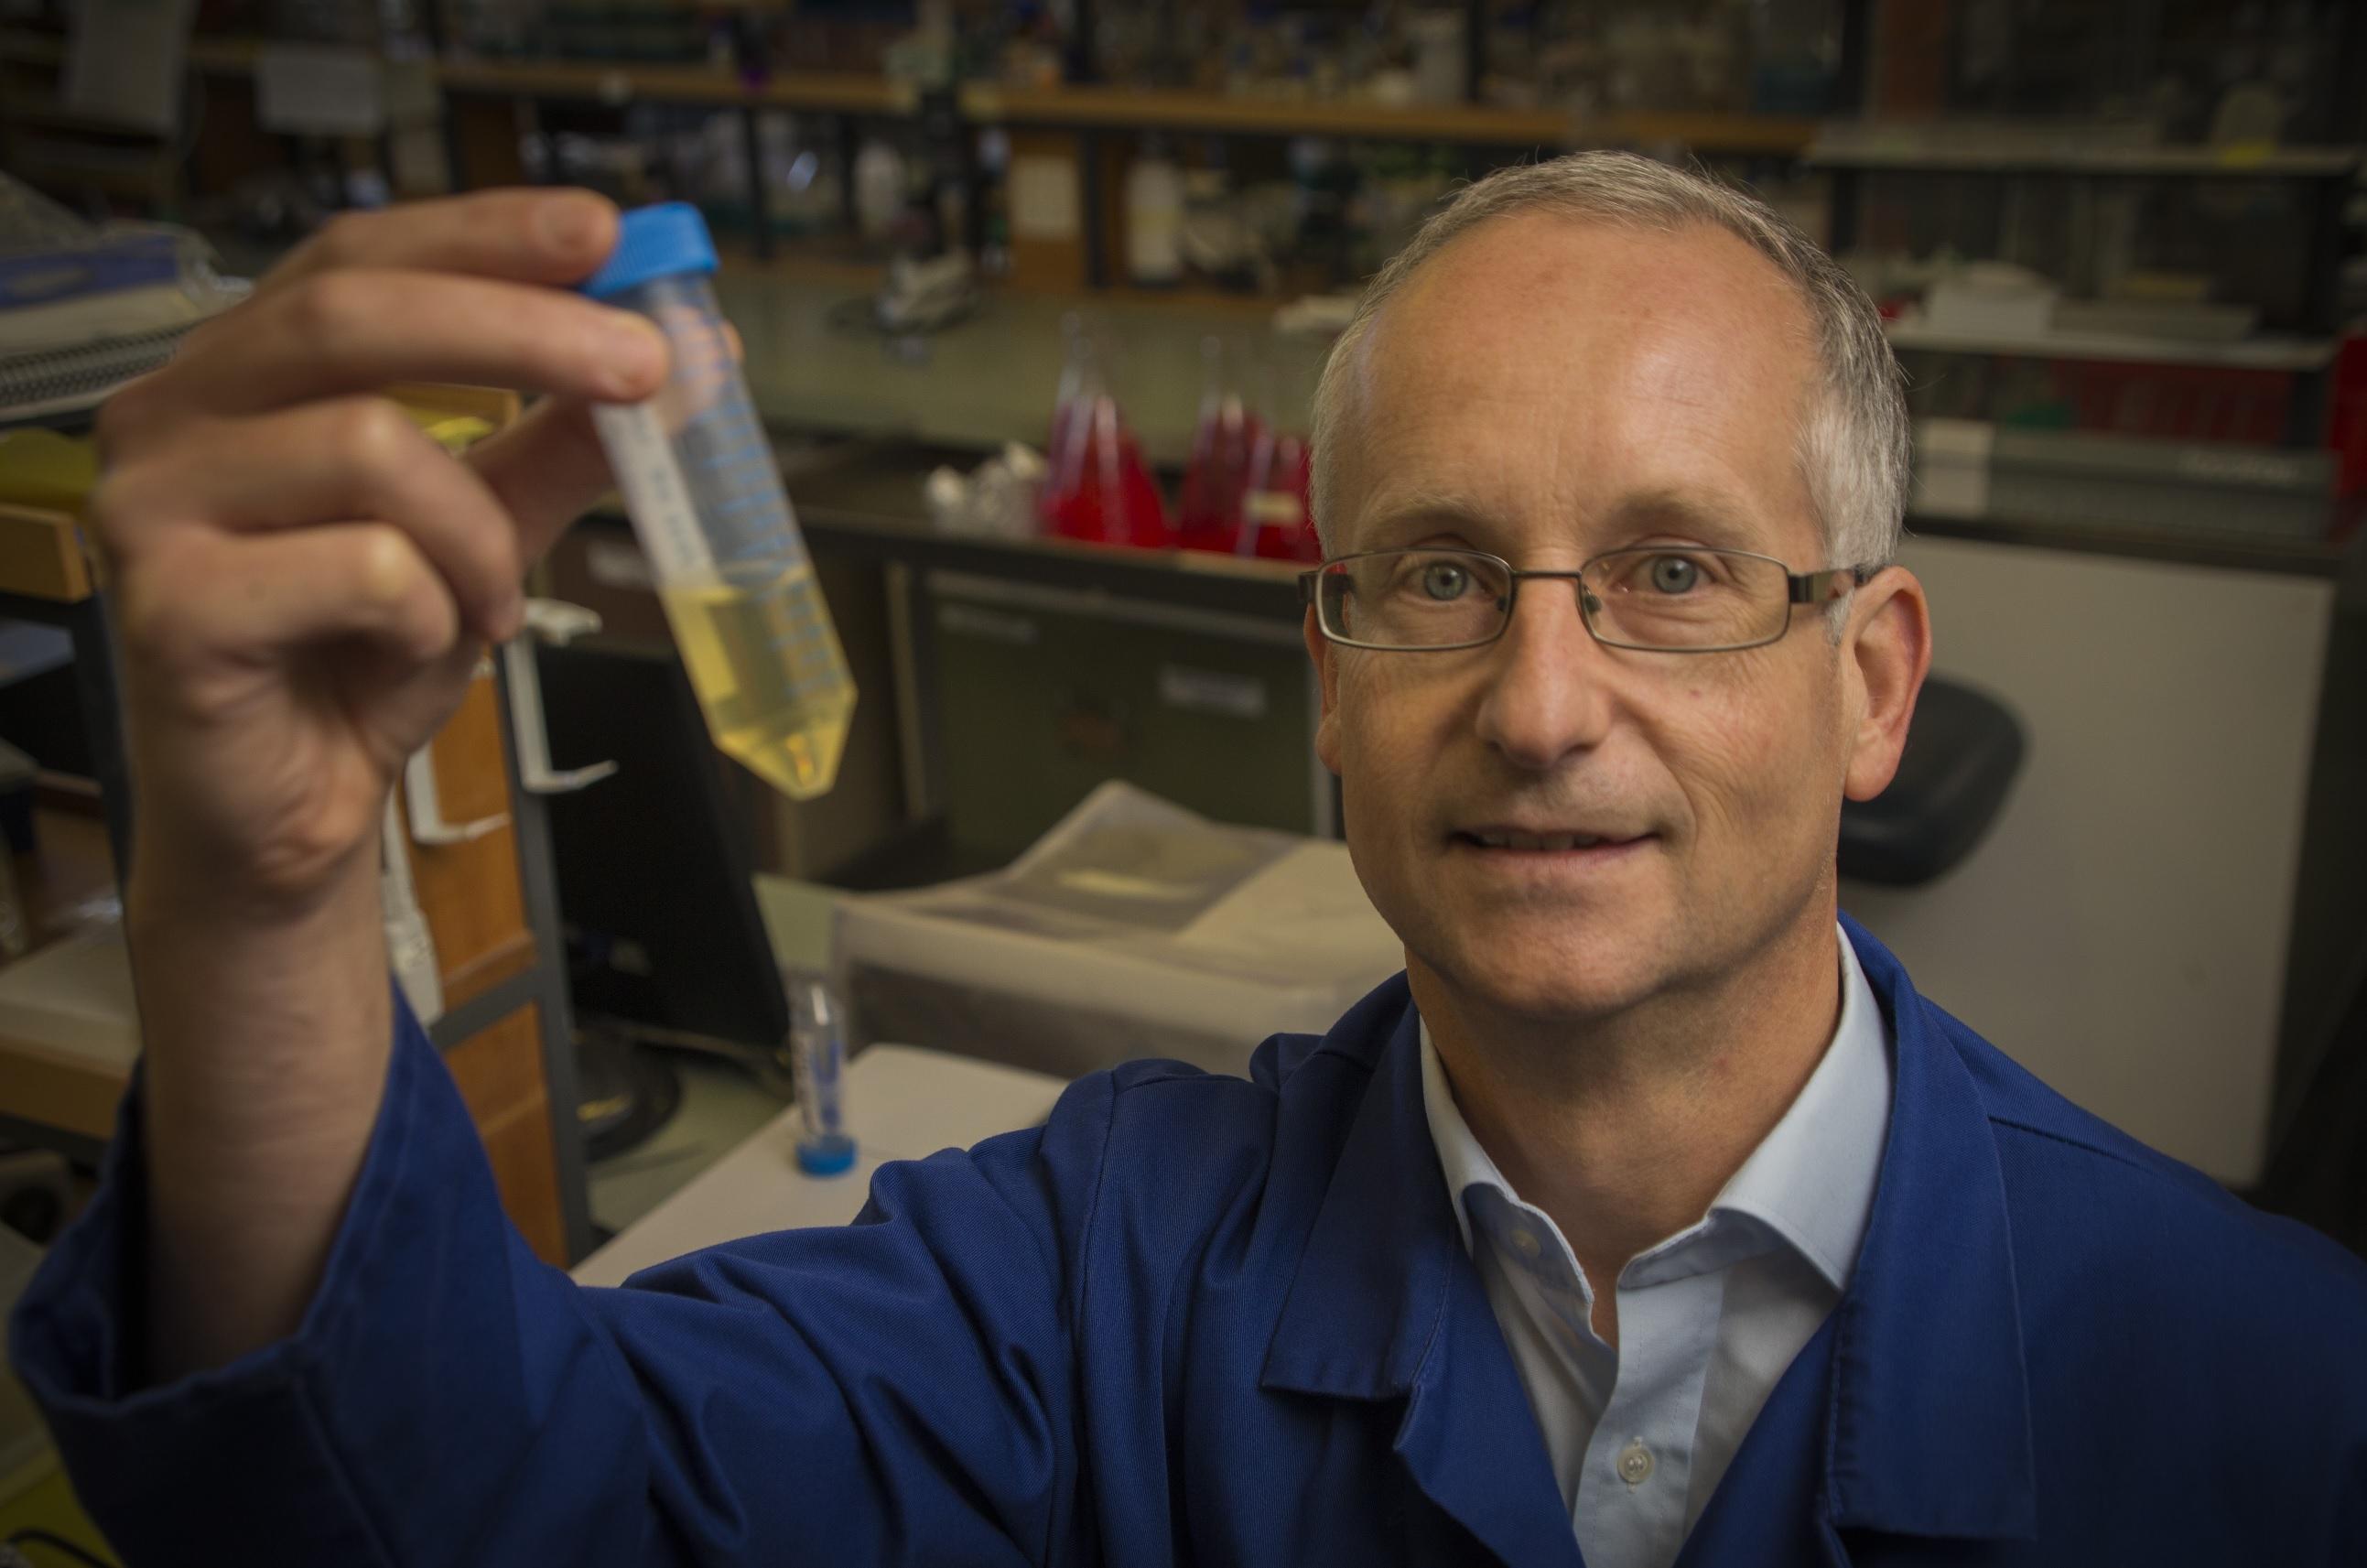 Professor Bernd Rehm